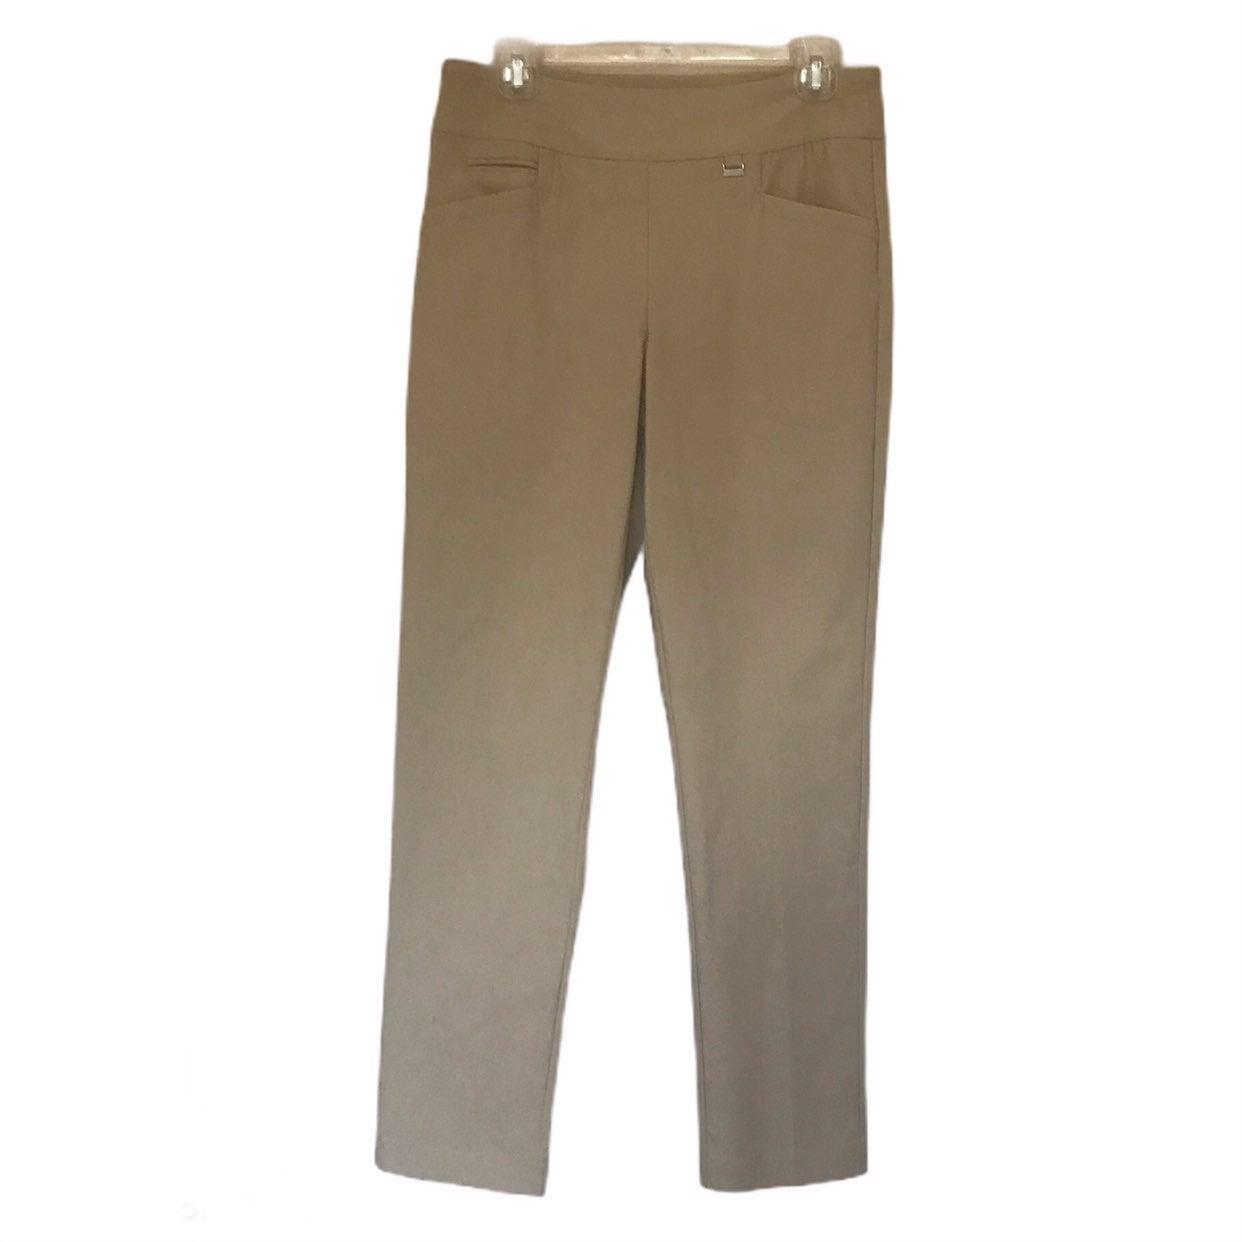 EP Pro Bi-Stretch Ankle Golf Pants